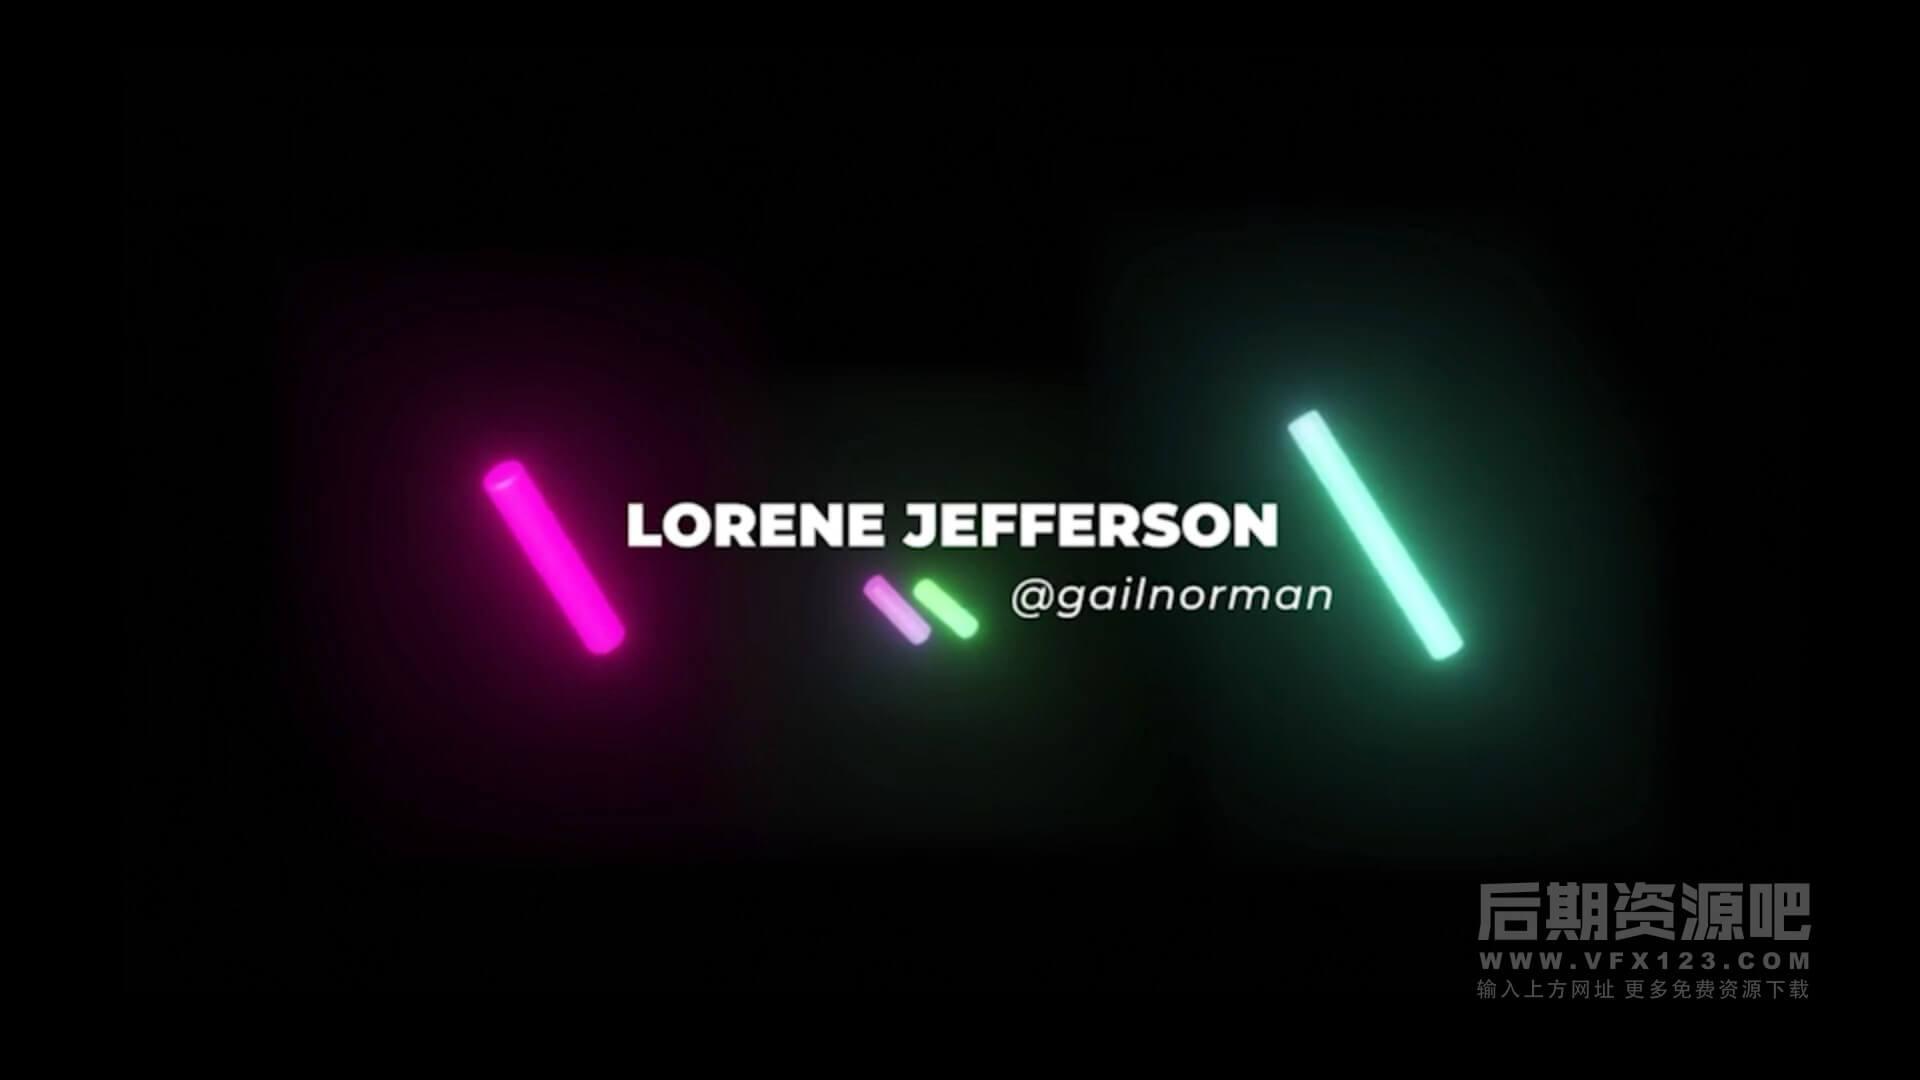 fcpx标题插件 27组时尚霓虹灯闪光效果标题模板 Lower Thirds Neon Titles